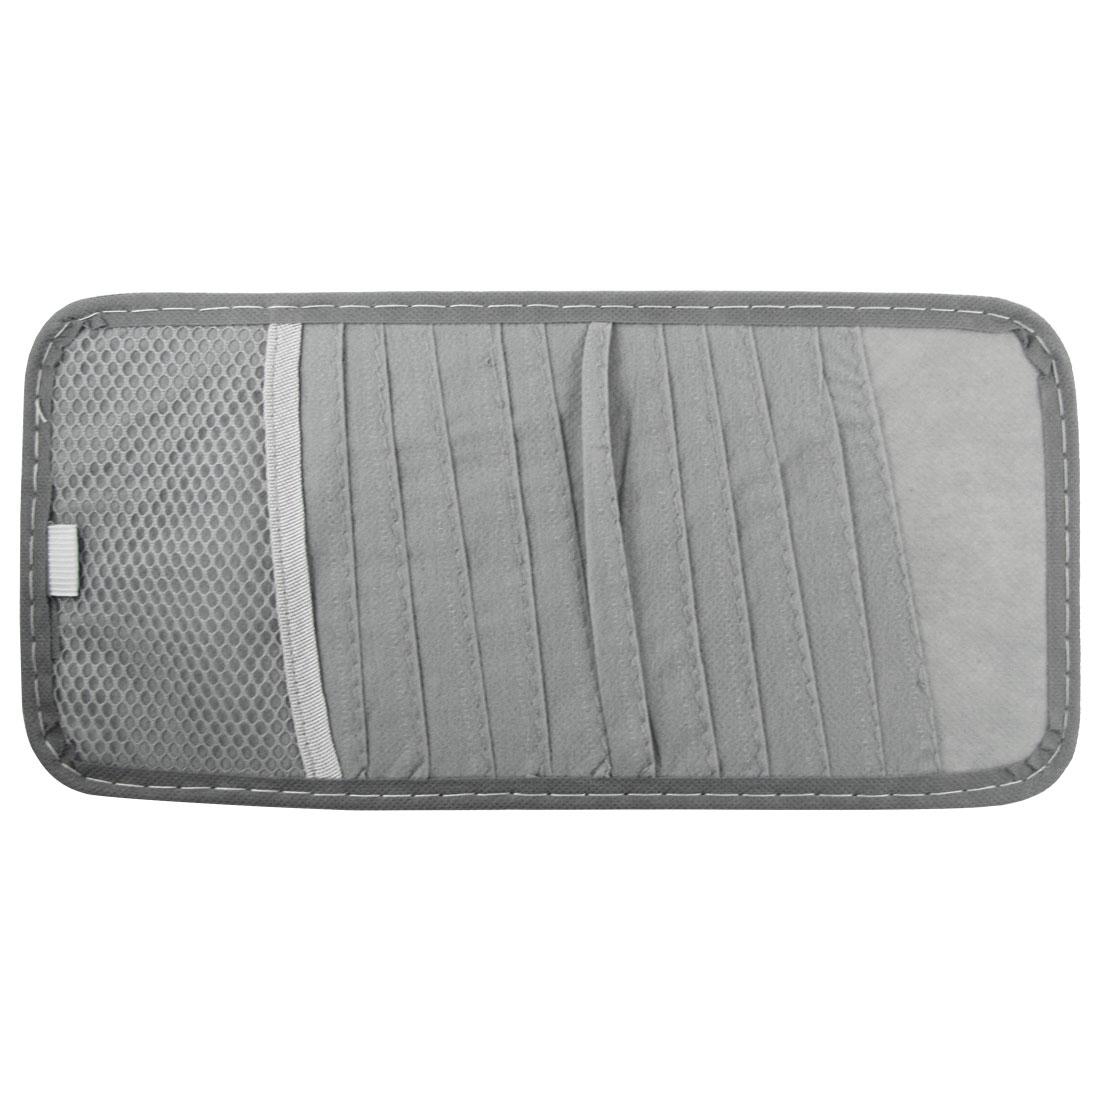 Gray Sun Visor CD Holder Case 12 Compartments for Car Auto